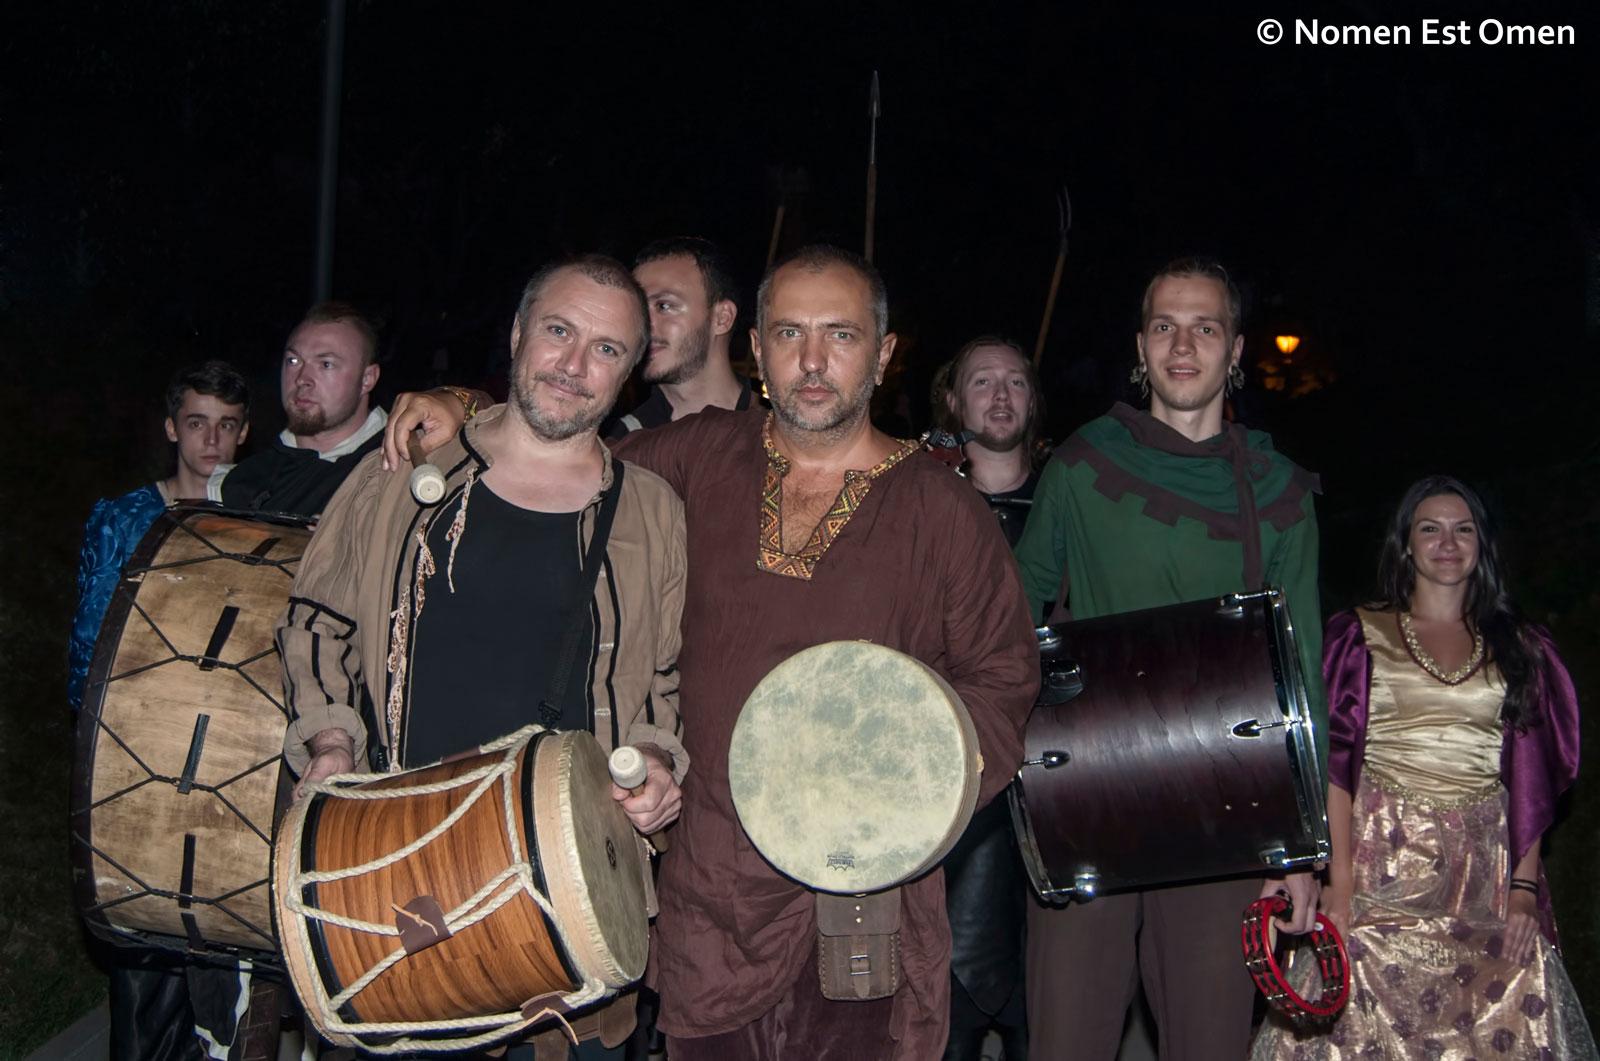 Nomen Est Omen si Obscurus Orbis la Sibiu